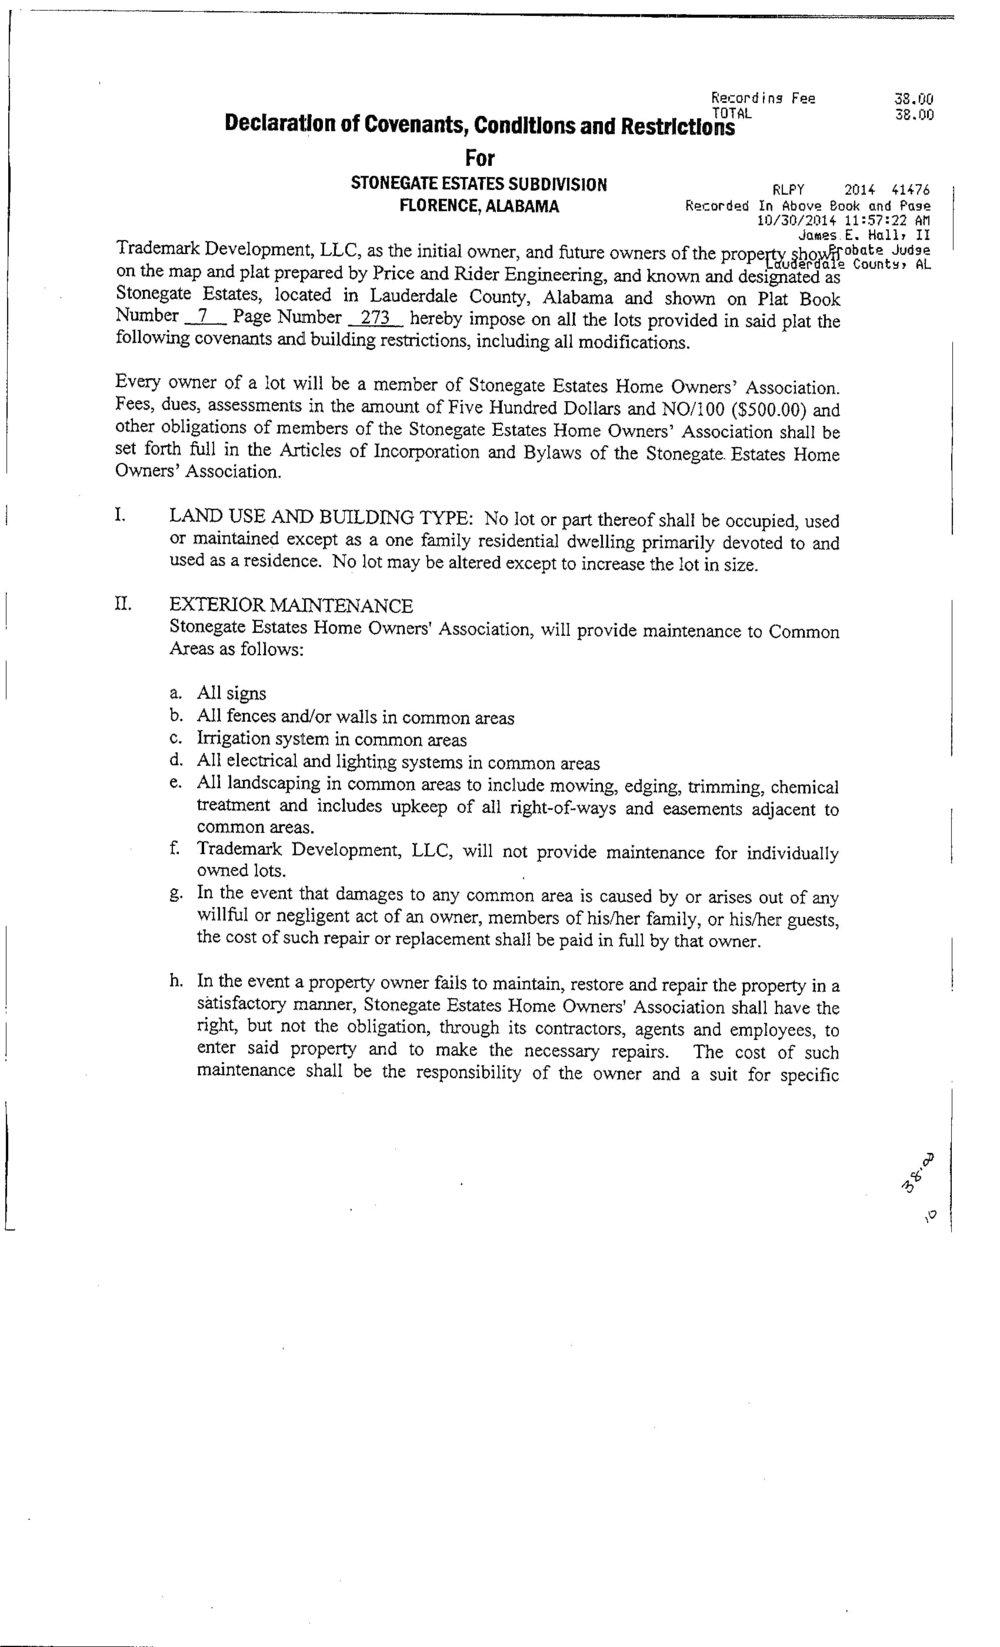 Covenants-Stonegate-Estates1-01.jpg